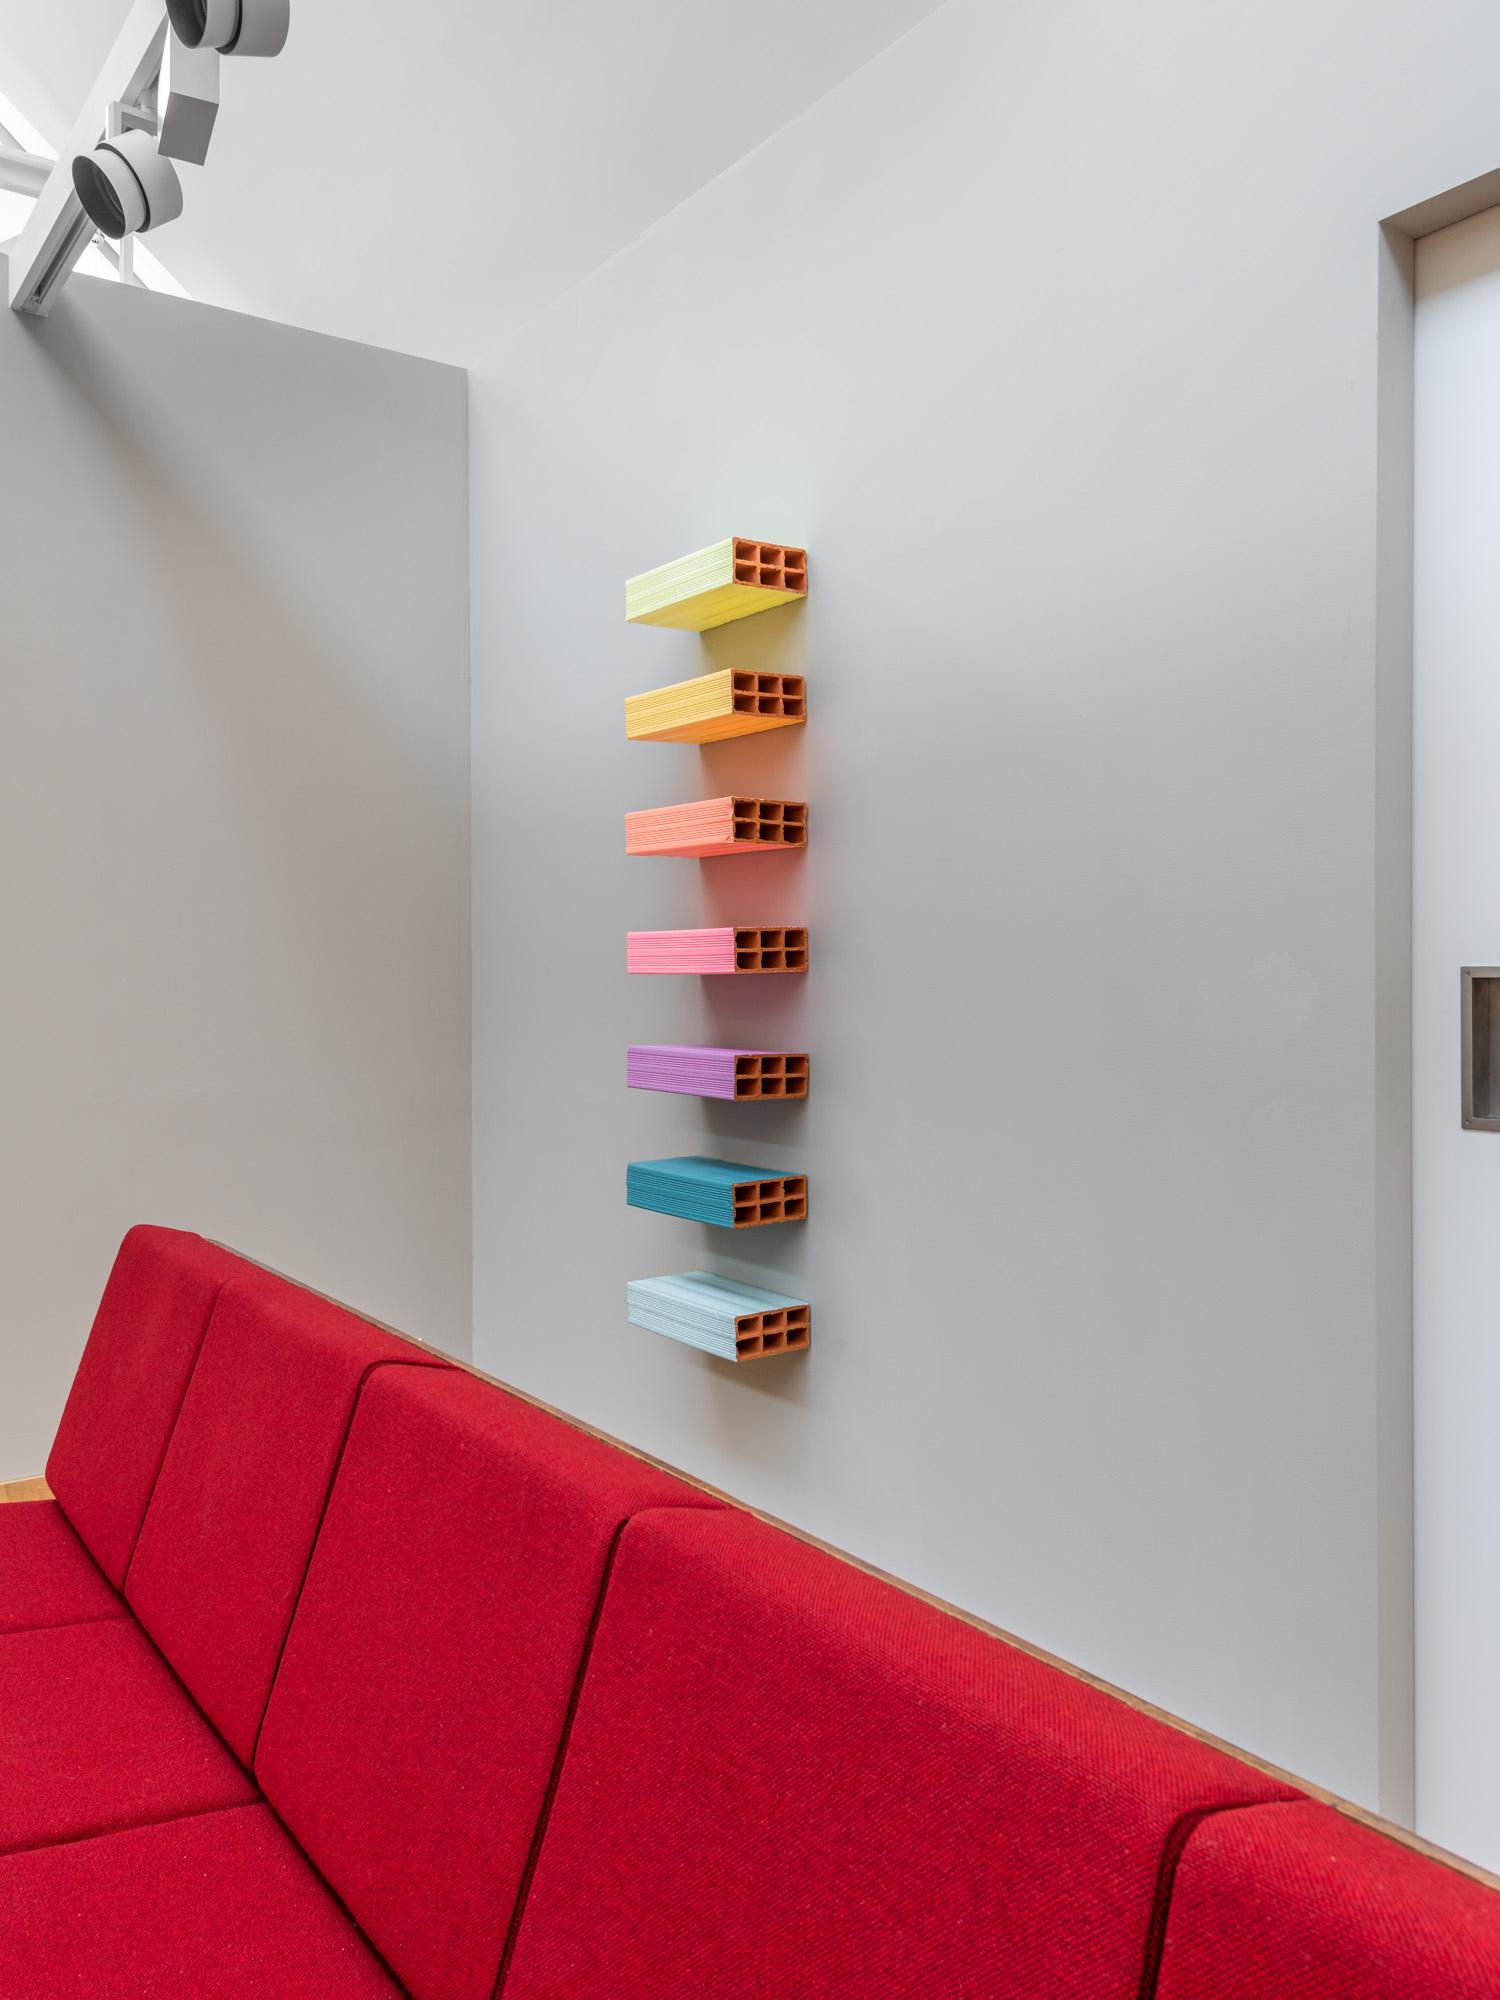 VonBartha_2020_Galerie-Showroom_Basel_DSC4051_web_(c)Ben_Koechlin